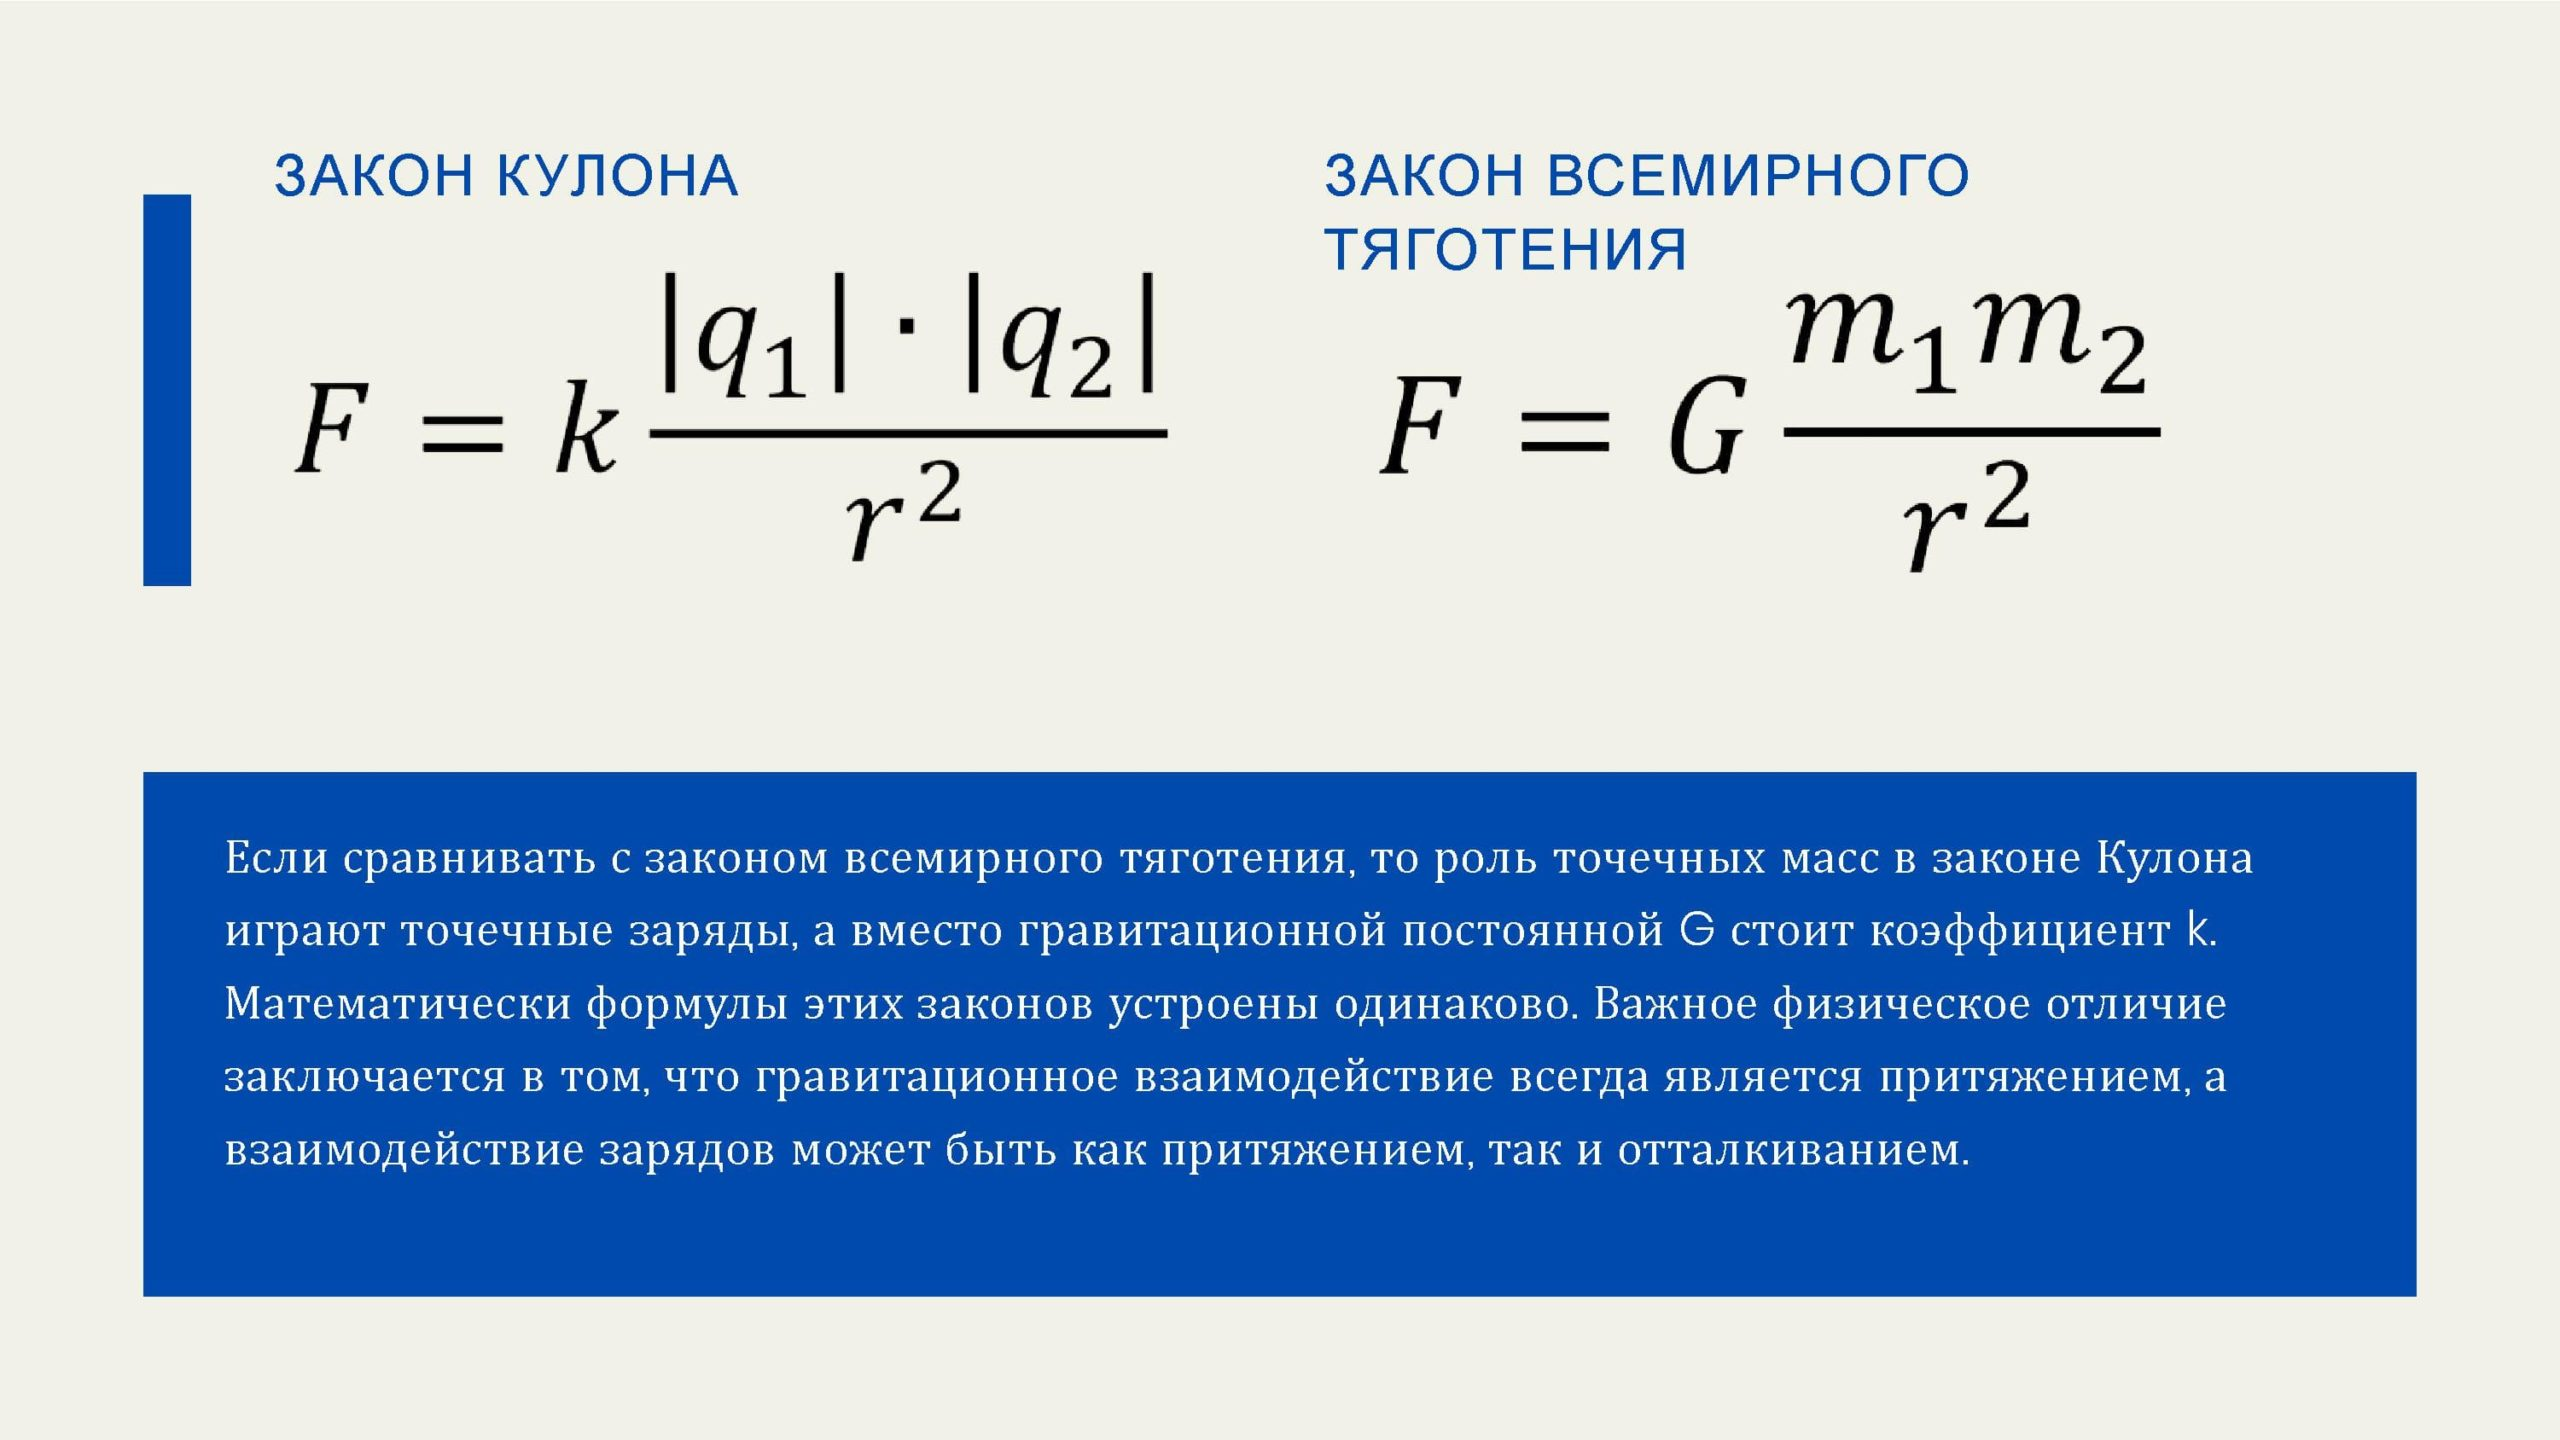 Закон Кулона формула. Закон всемирного тяготения формула